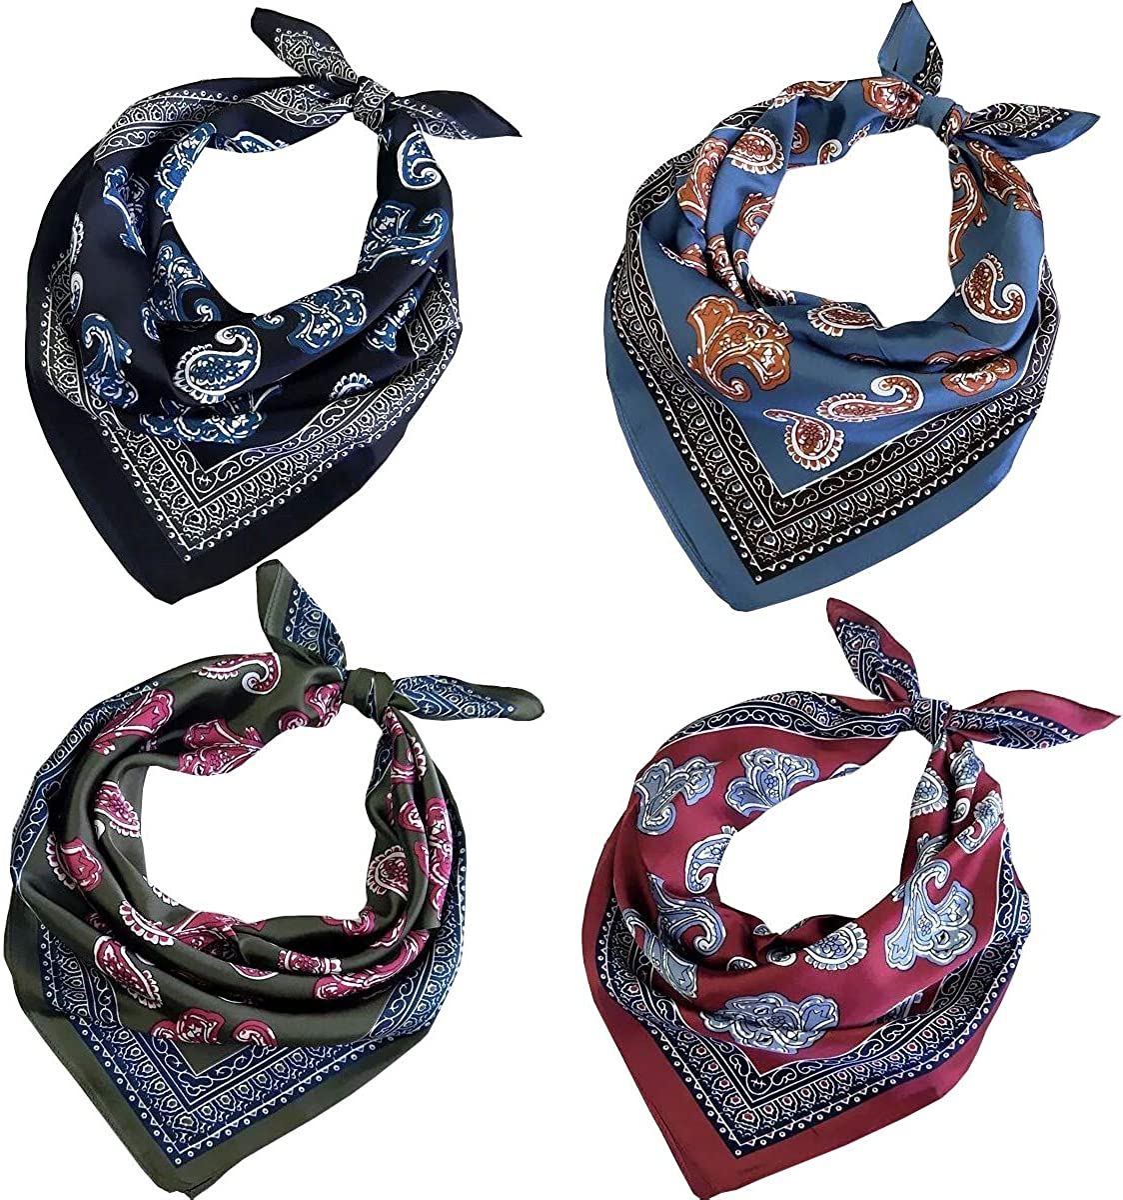 FYLuoke Silk Feeling Satin Super beauty product restock quality top! HeadScarf Cheap mail order shopping for Scarf Neck Hair Bandana